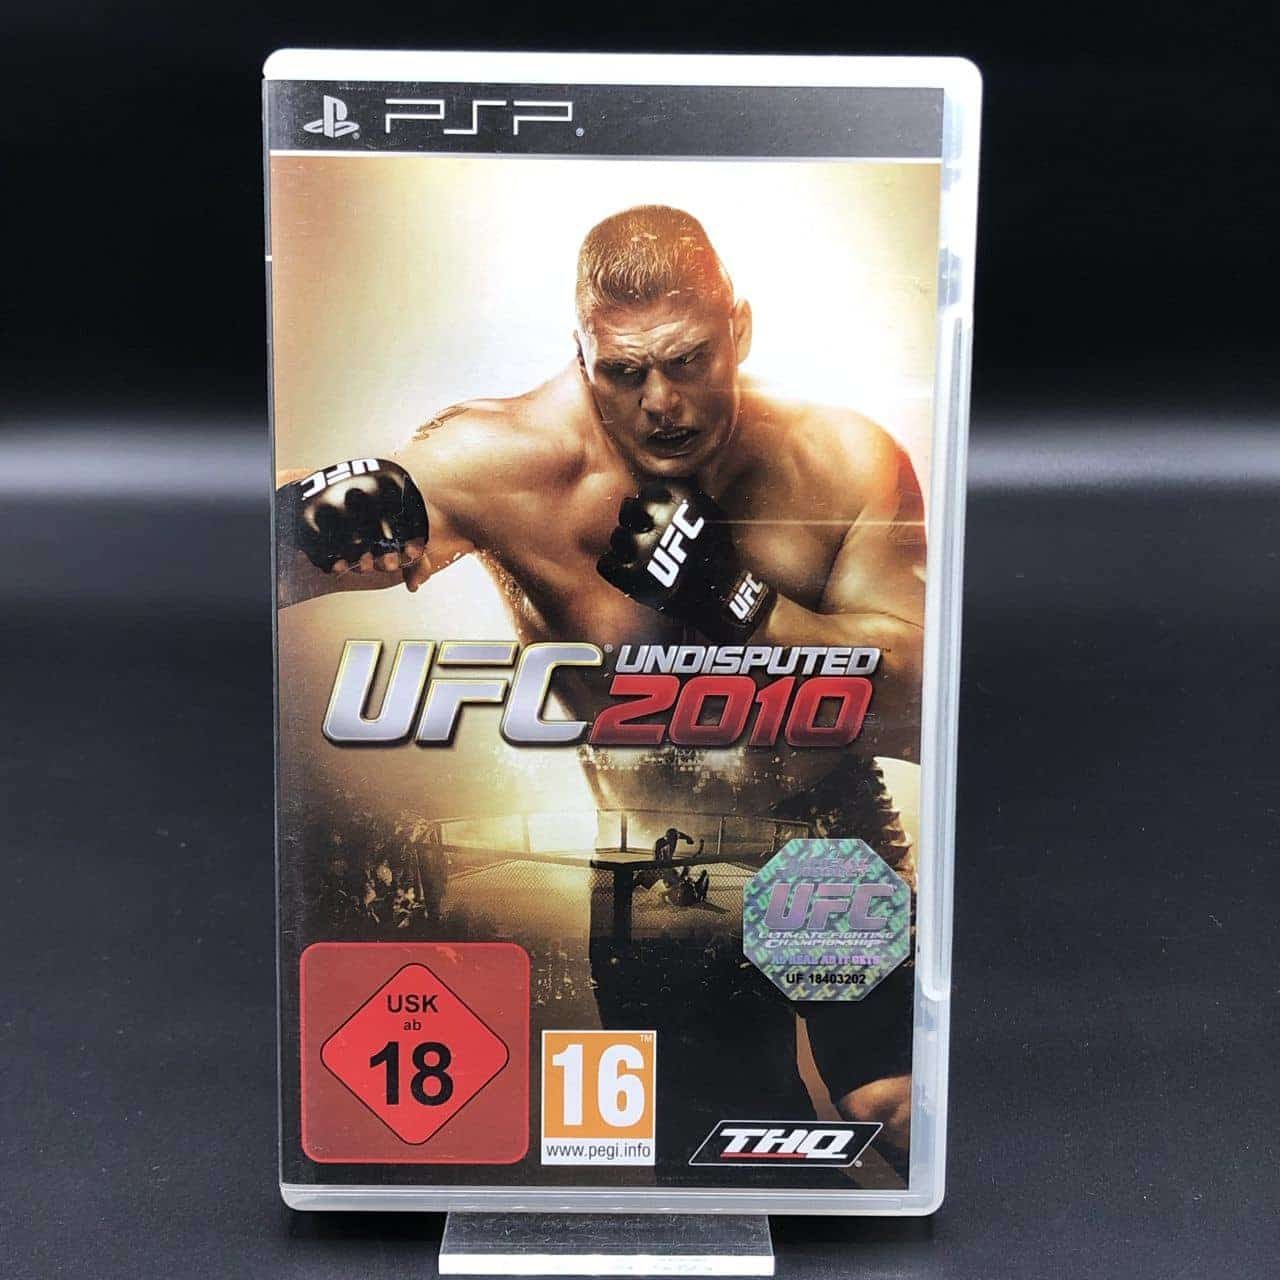 PSP UFC Undisputed 2010 (Komplett) (Gut) Sony PlayStation Portable (FSK18)